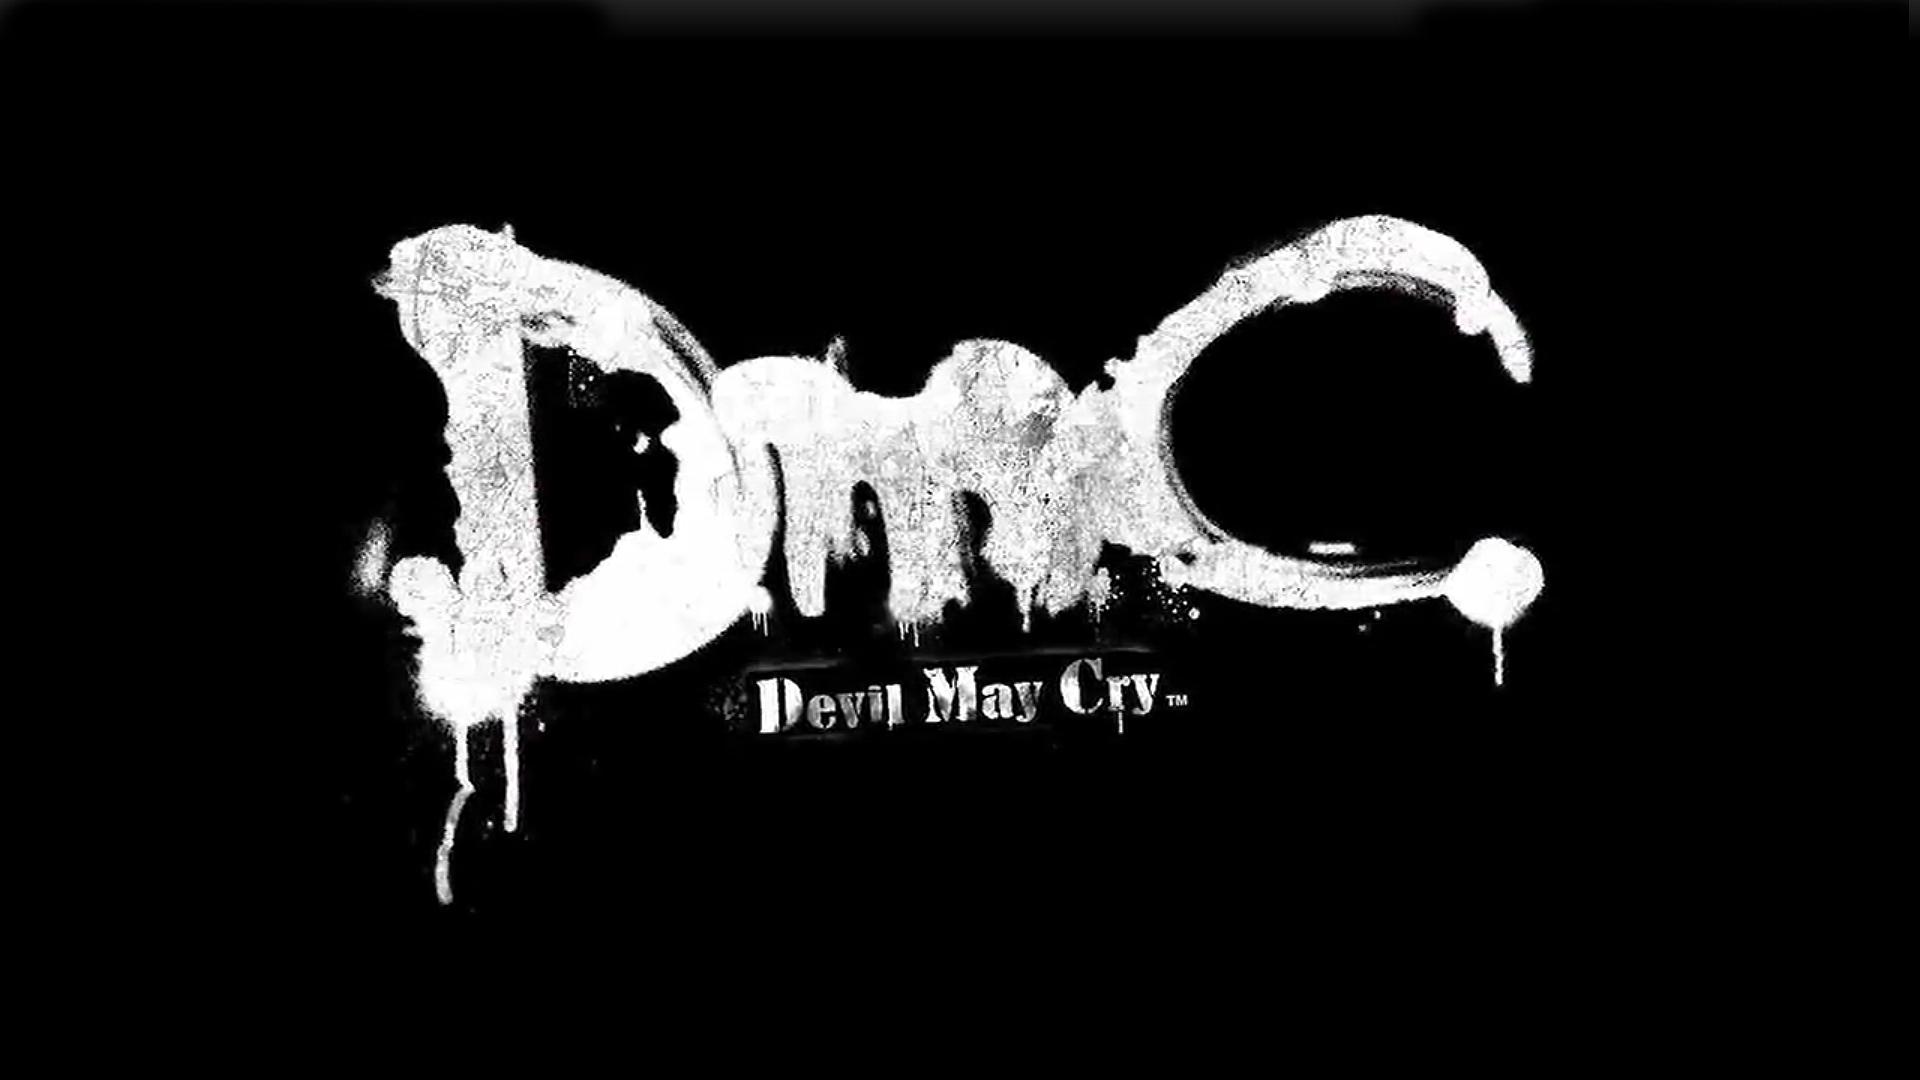 Pin Di Devil May Cry